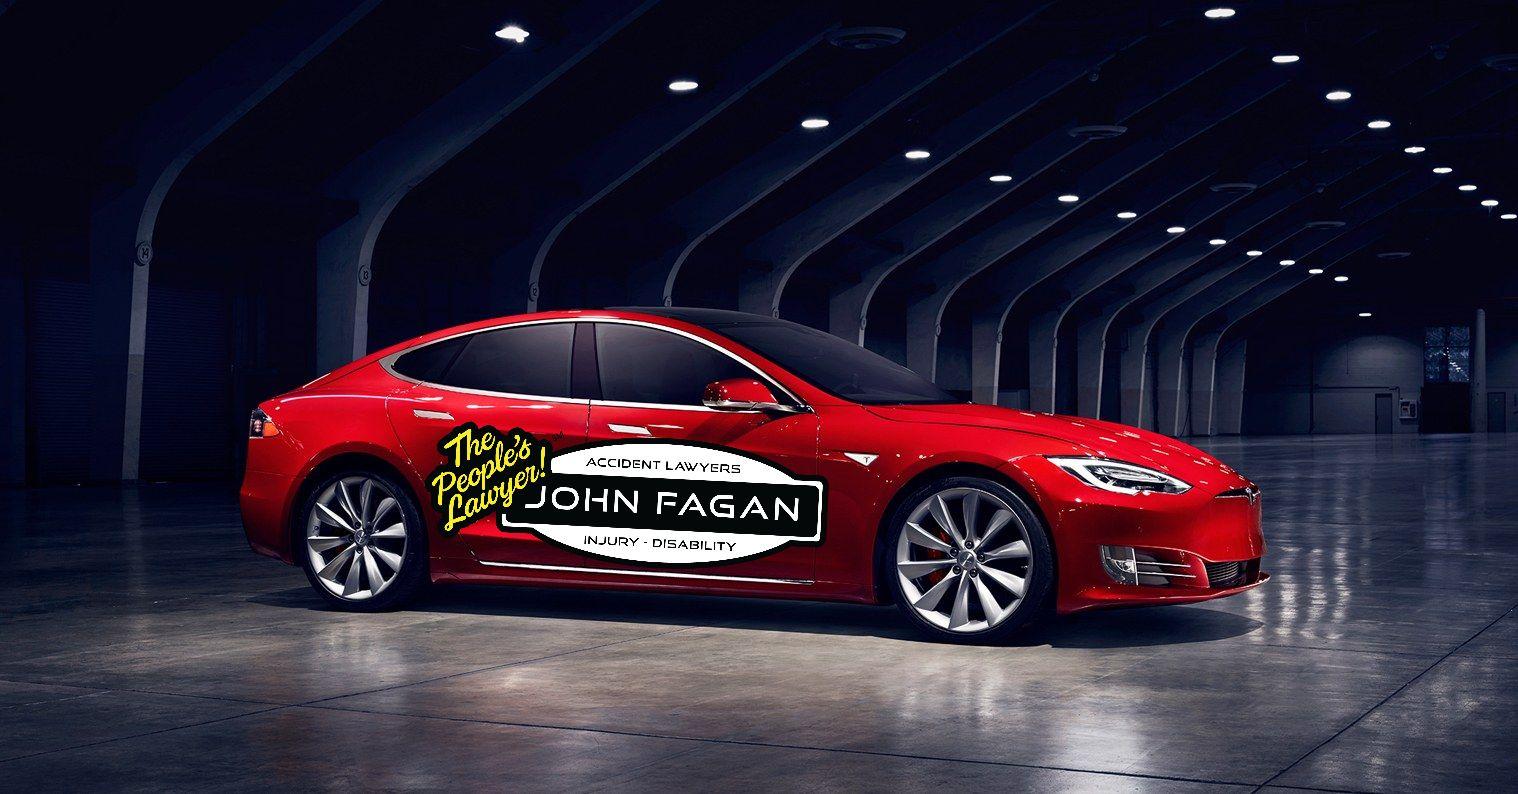 Tesla Bears Some Blame for Self-Driving Crash Death, Feds Say